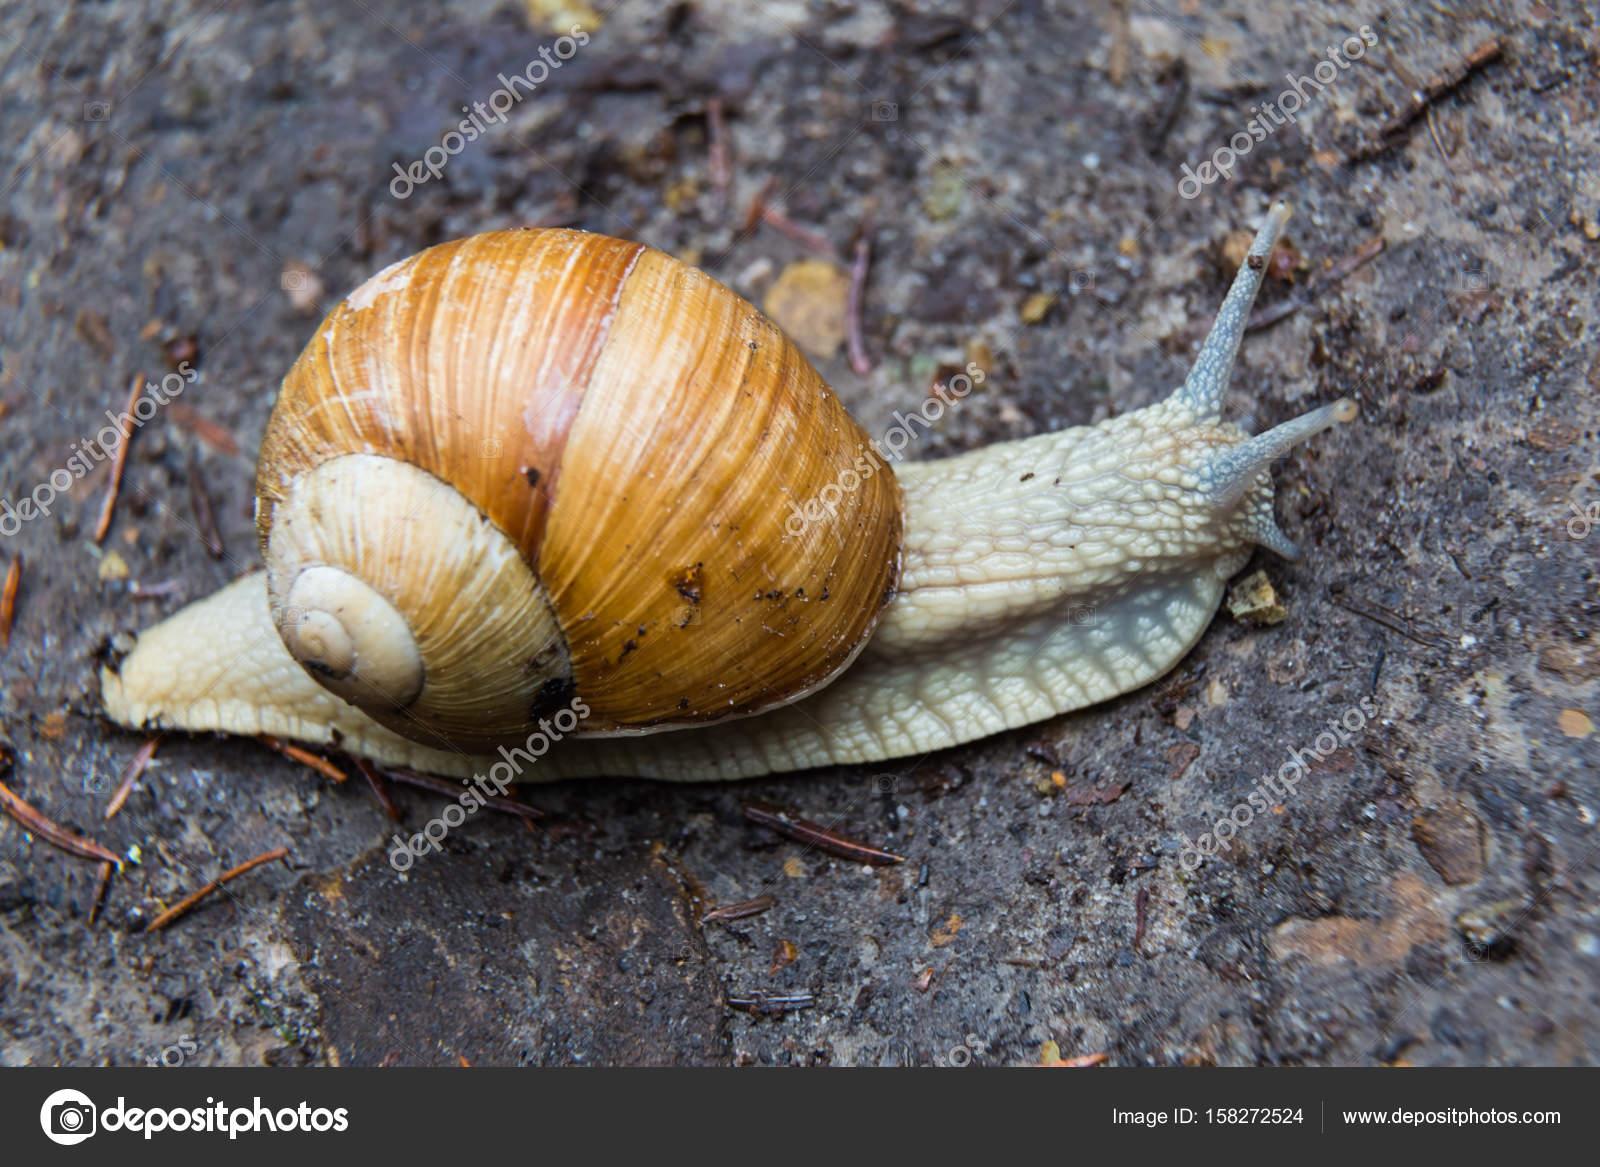 snail gastropod mollusk with spiral sheath stock photo